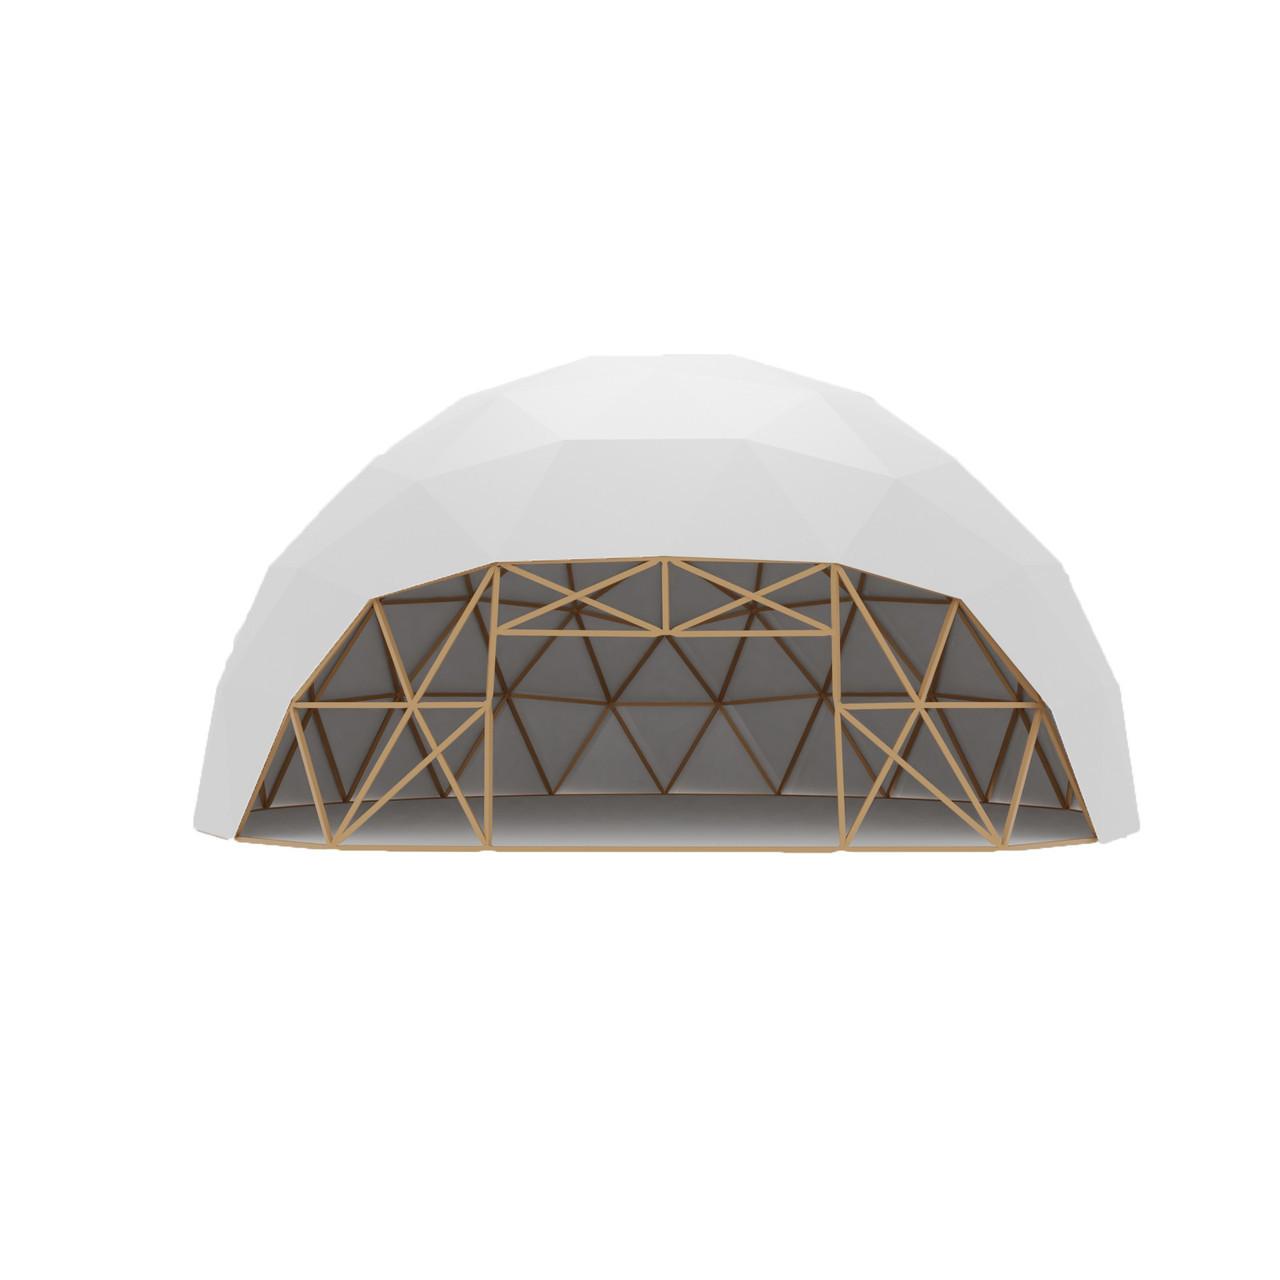 Сферический шатер диаметр 14 м